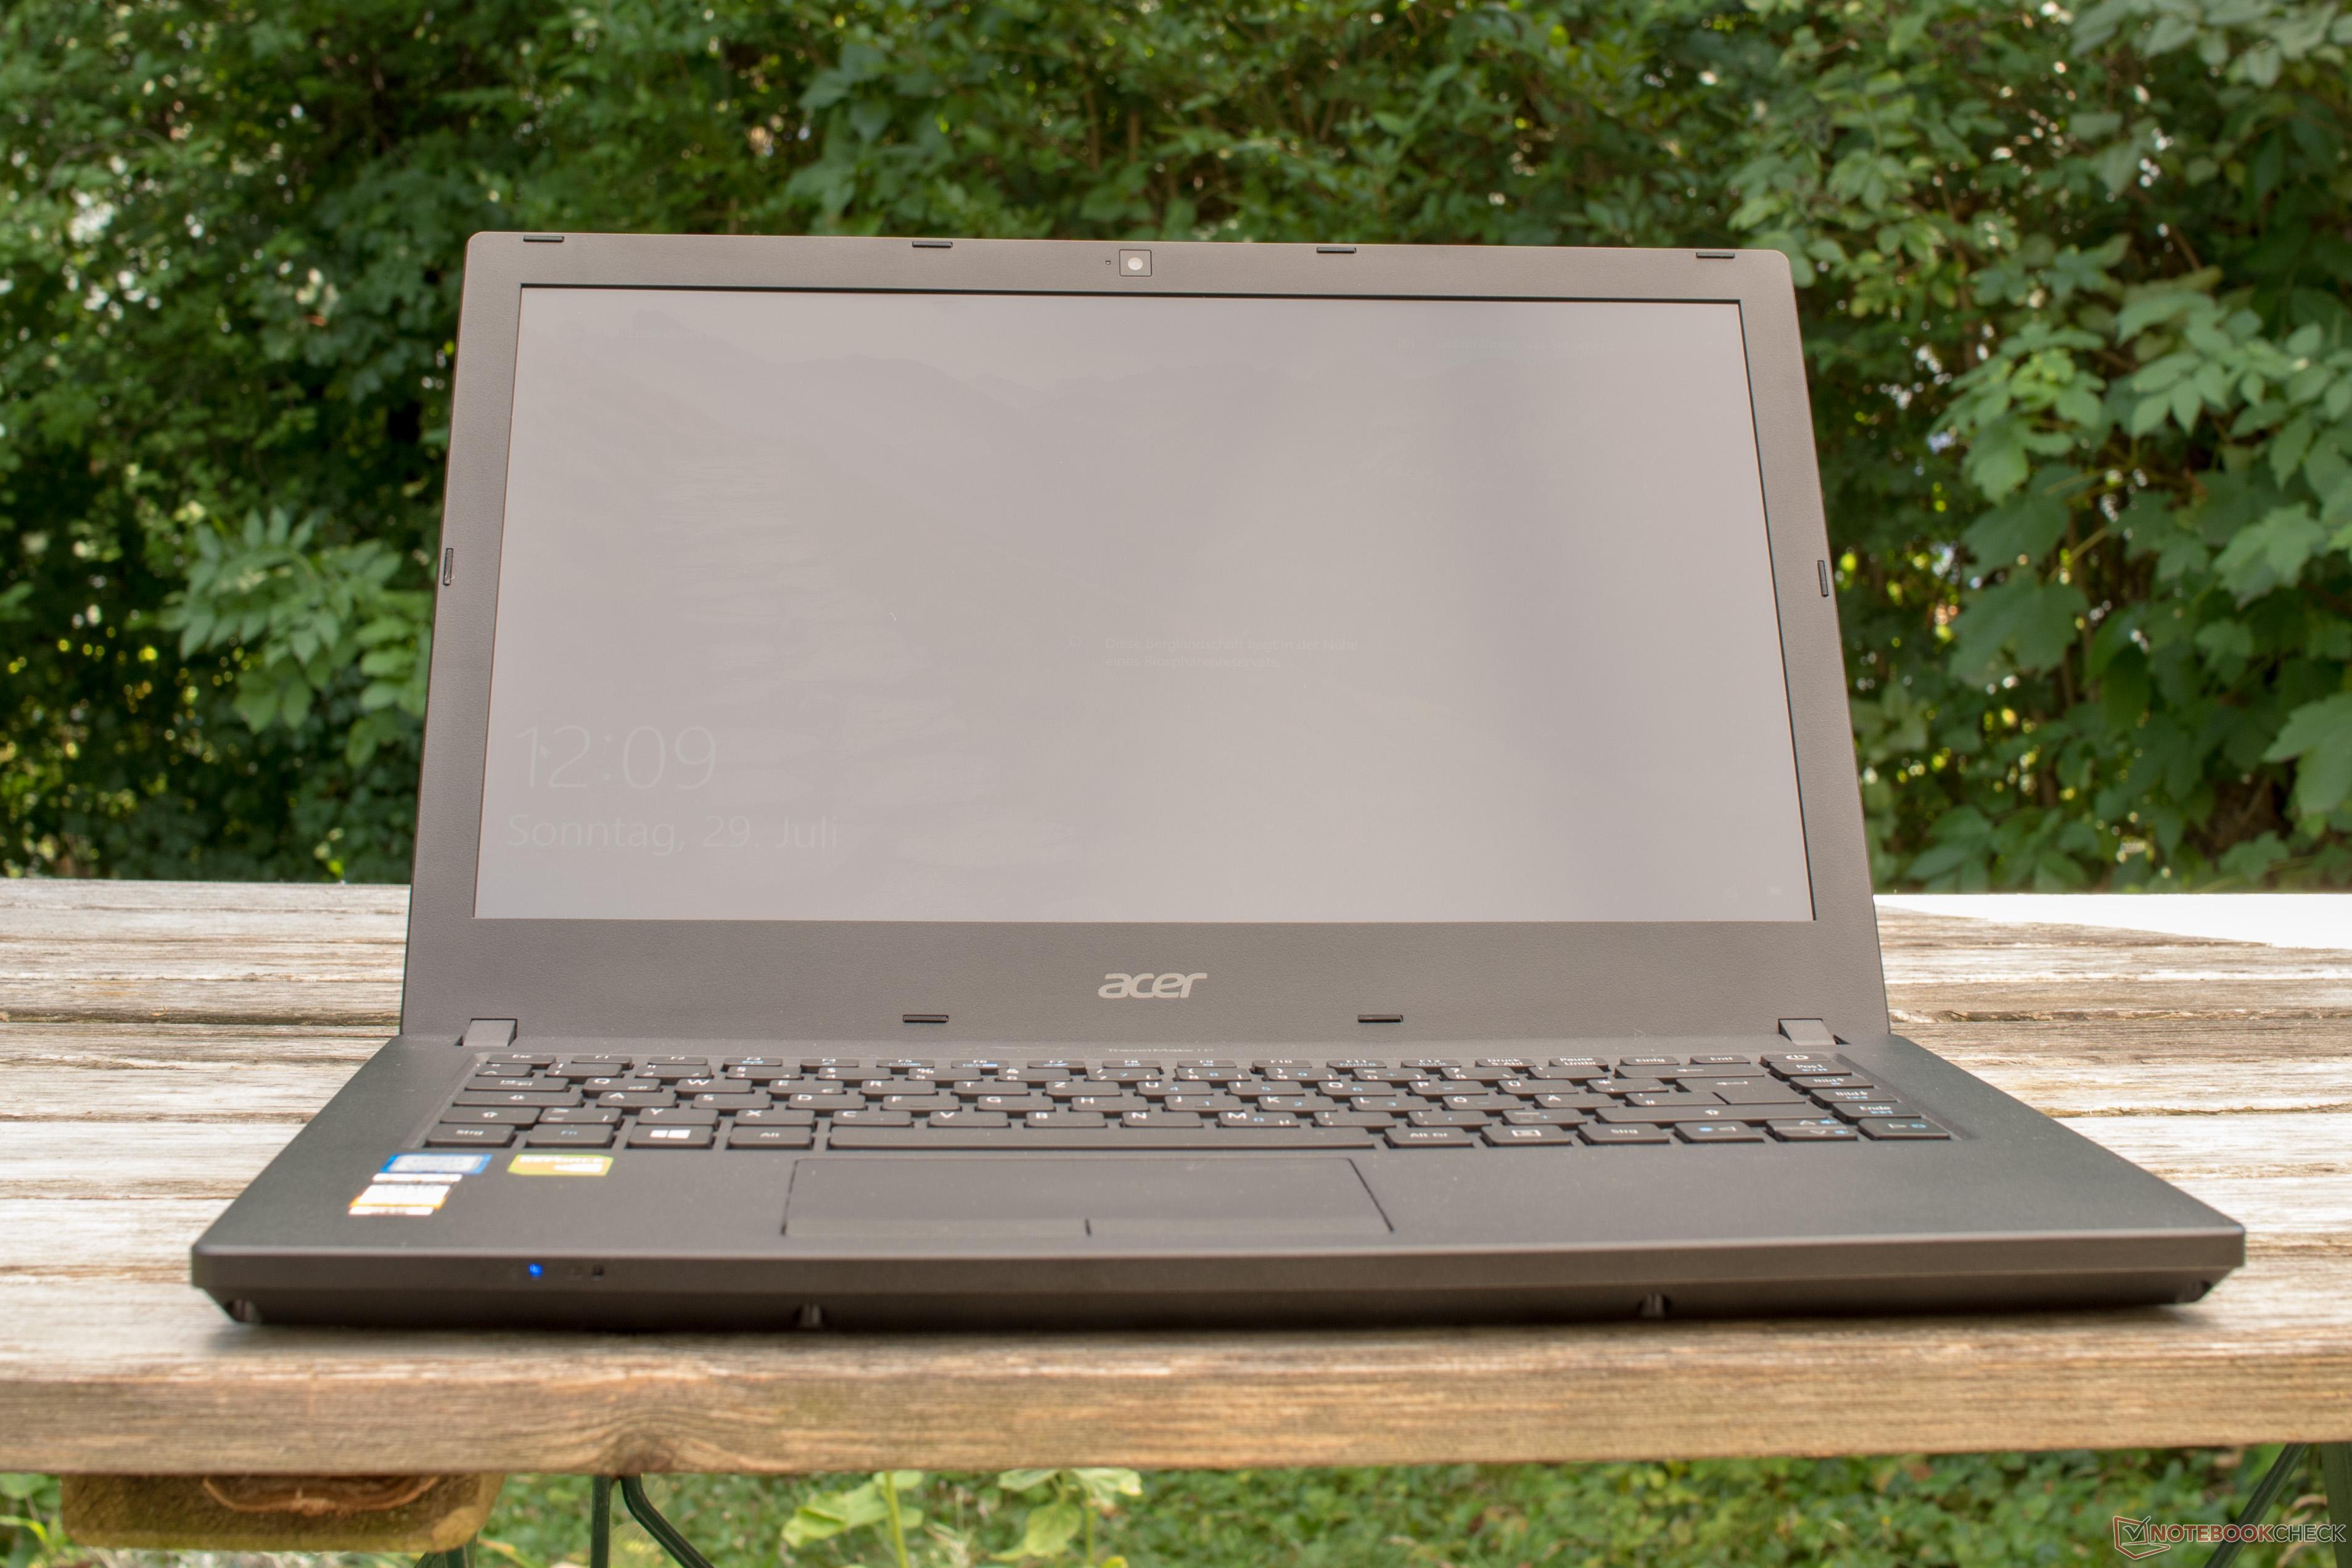 Acer TravelMate 2410 VGA Vista